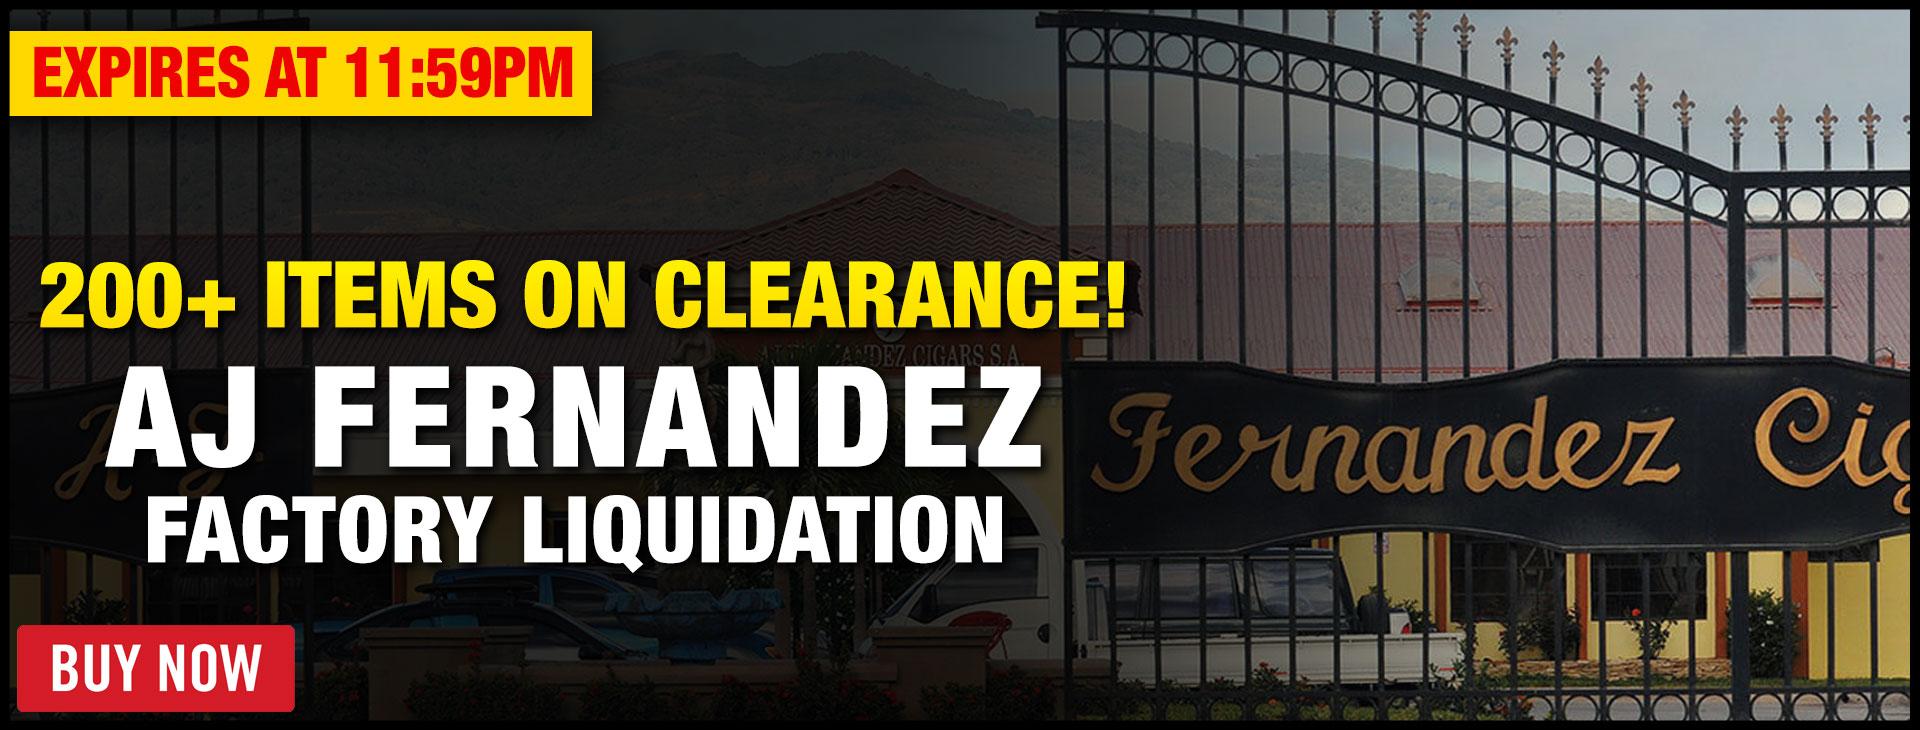 aj-fernandez-factory-liquidation-2021-banner.jpg